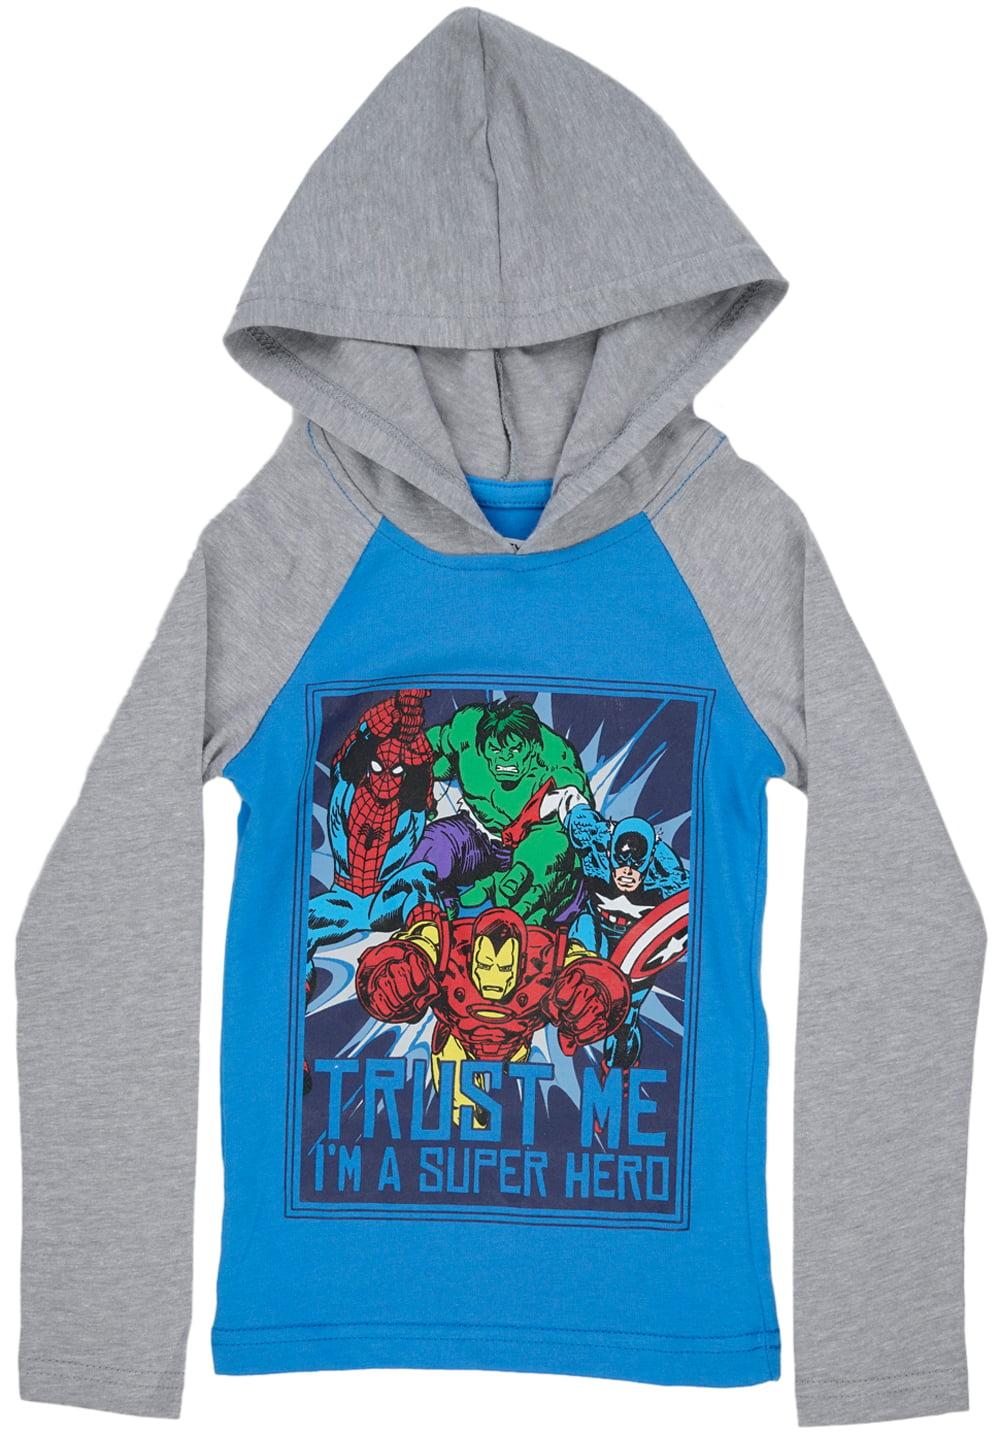 Toddlers The Avengers Hooded Long Sleeve Shirt Boys Marvel